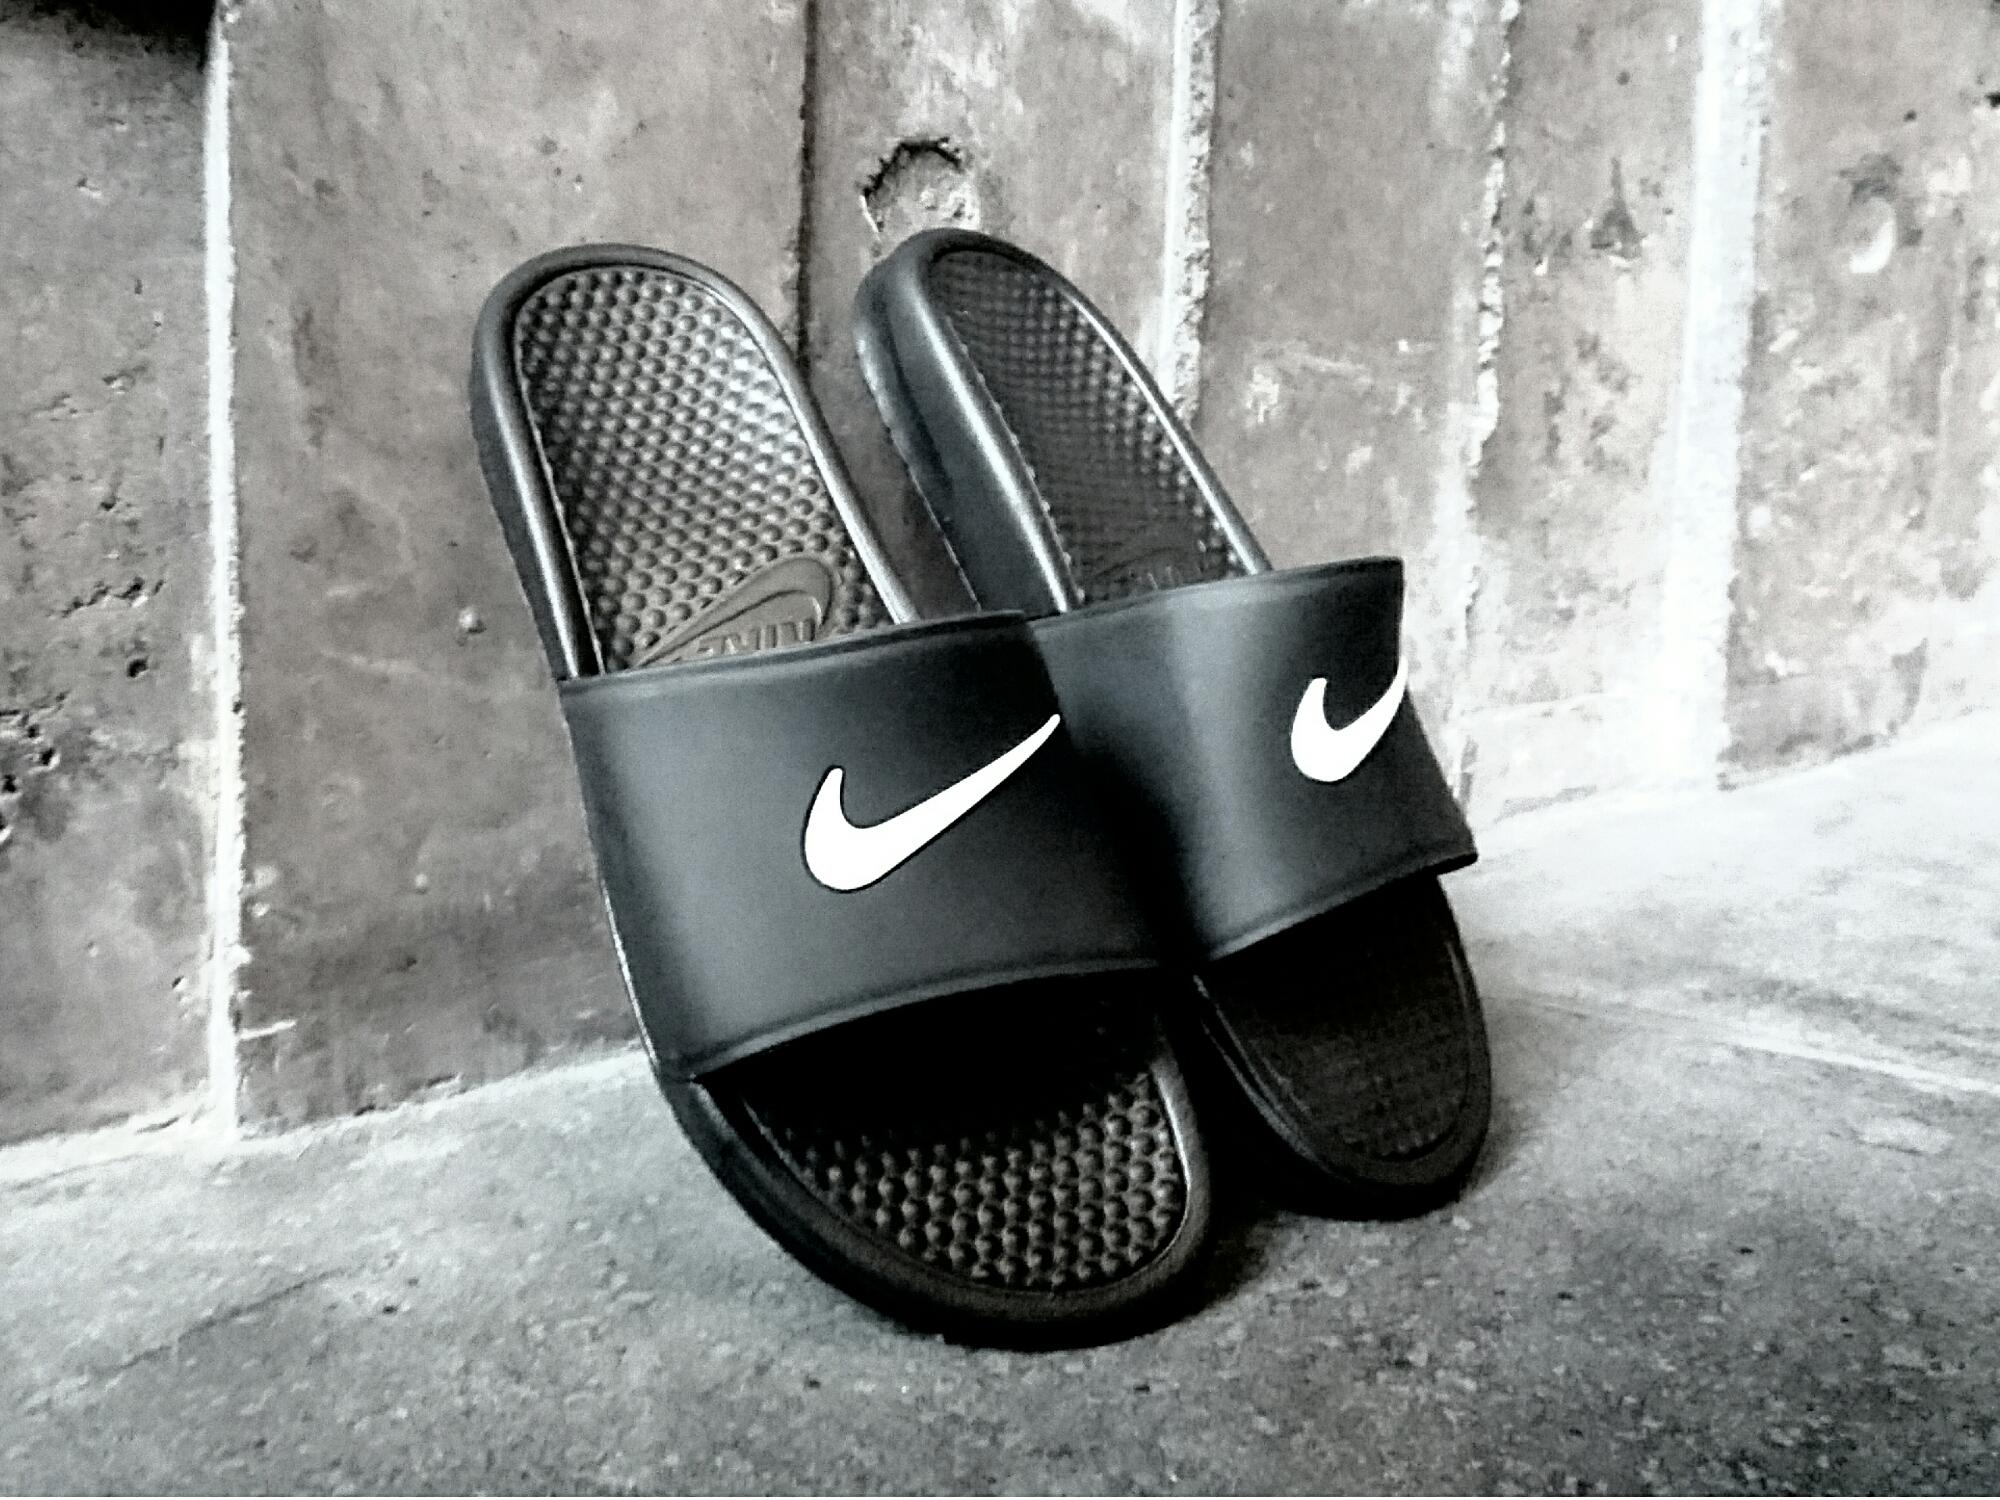 size 40 ad920 6b7e2 image. In the Benassi, Nike ...